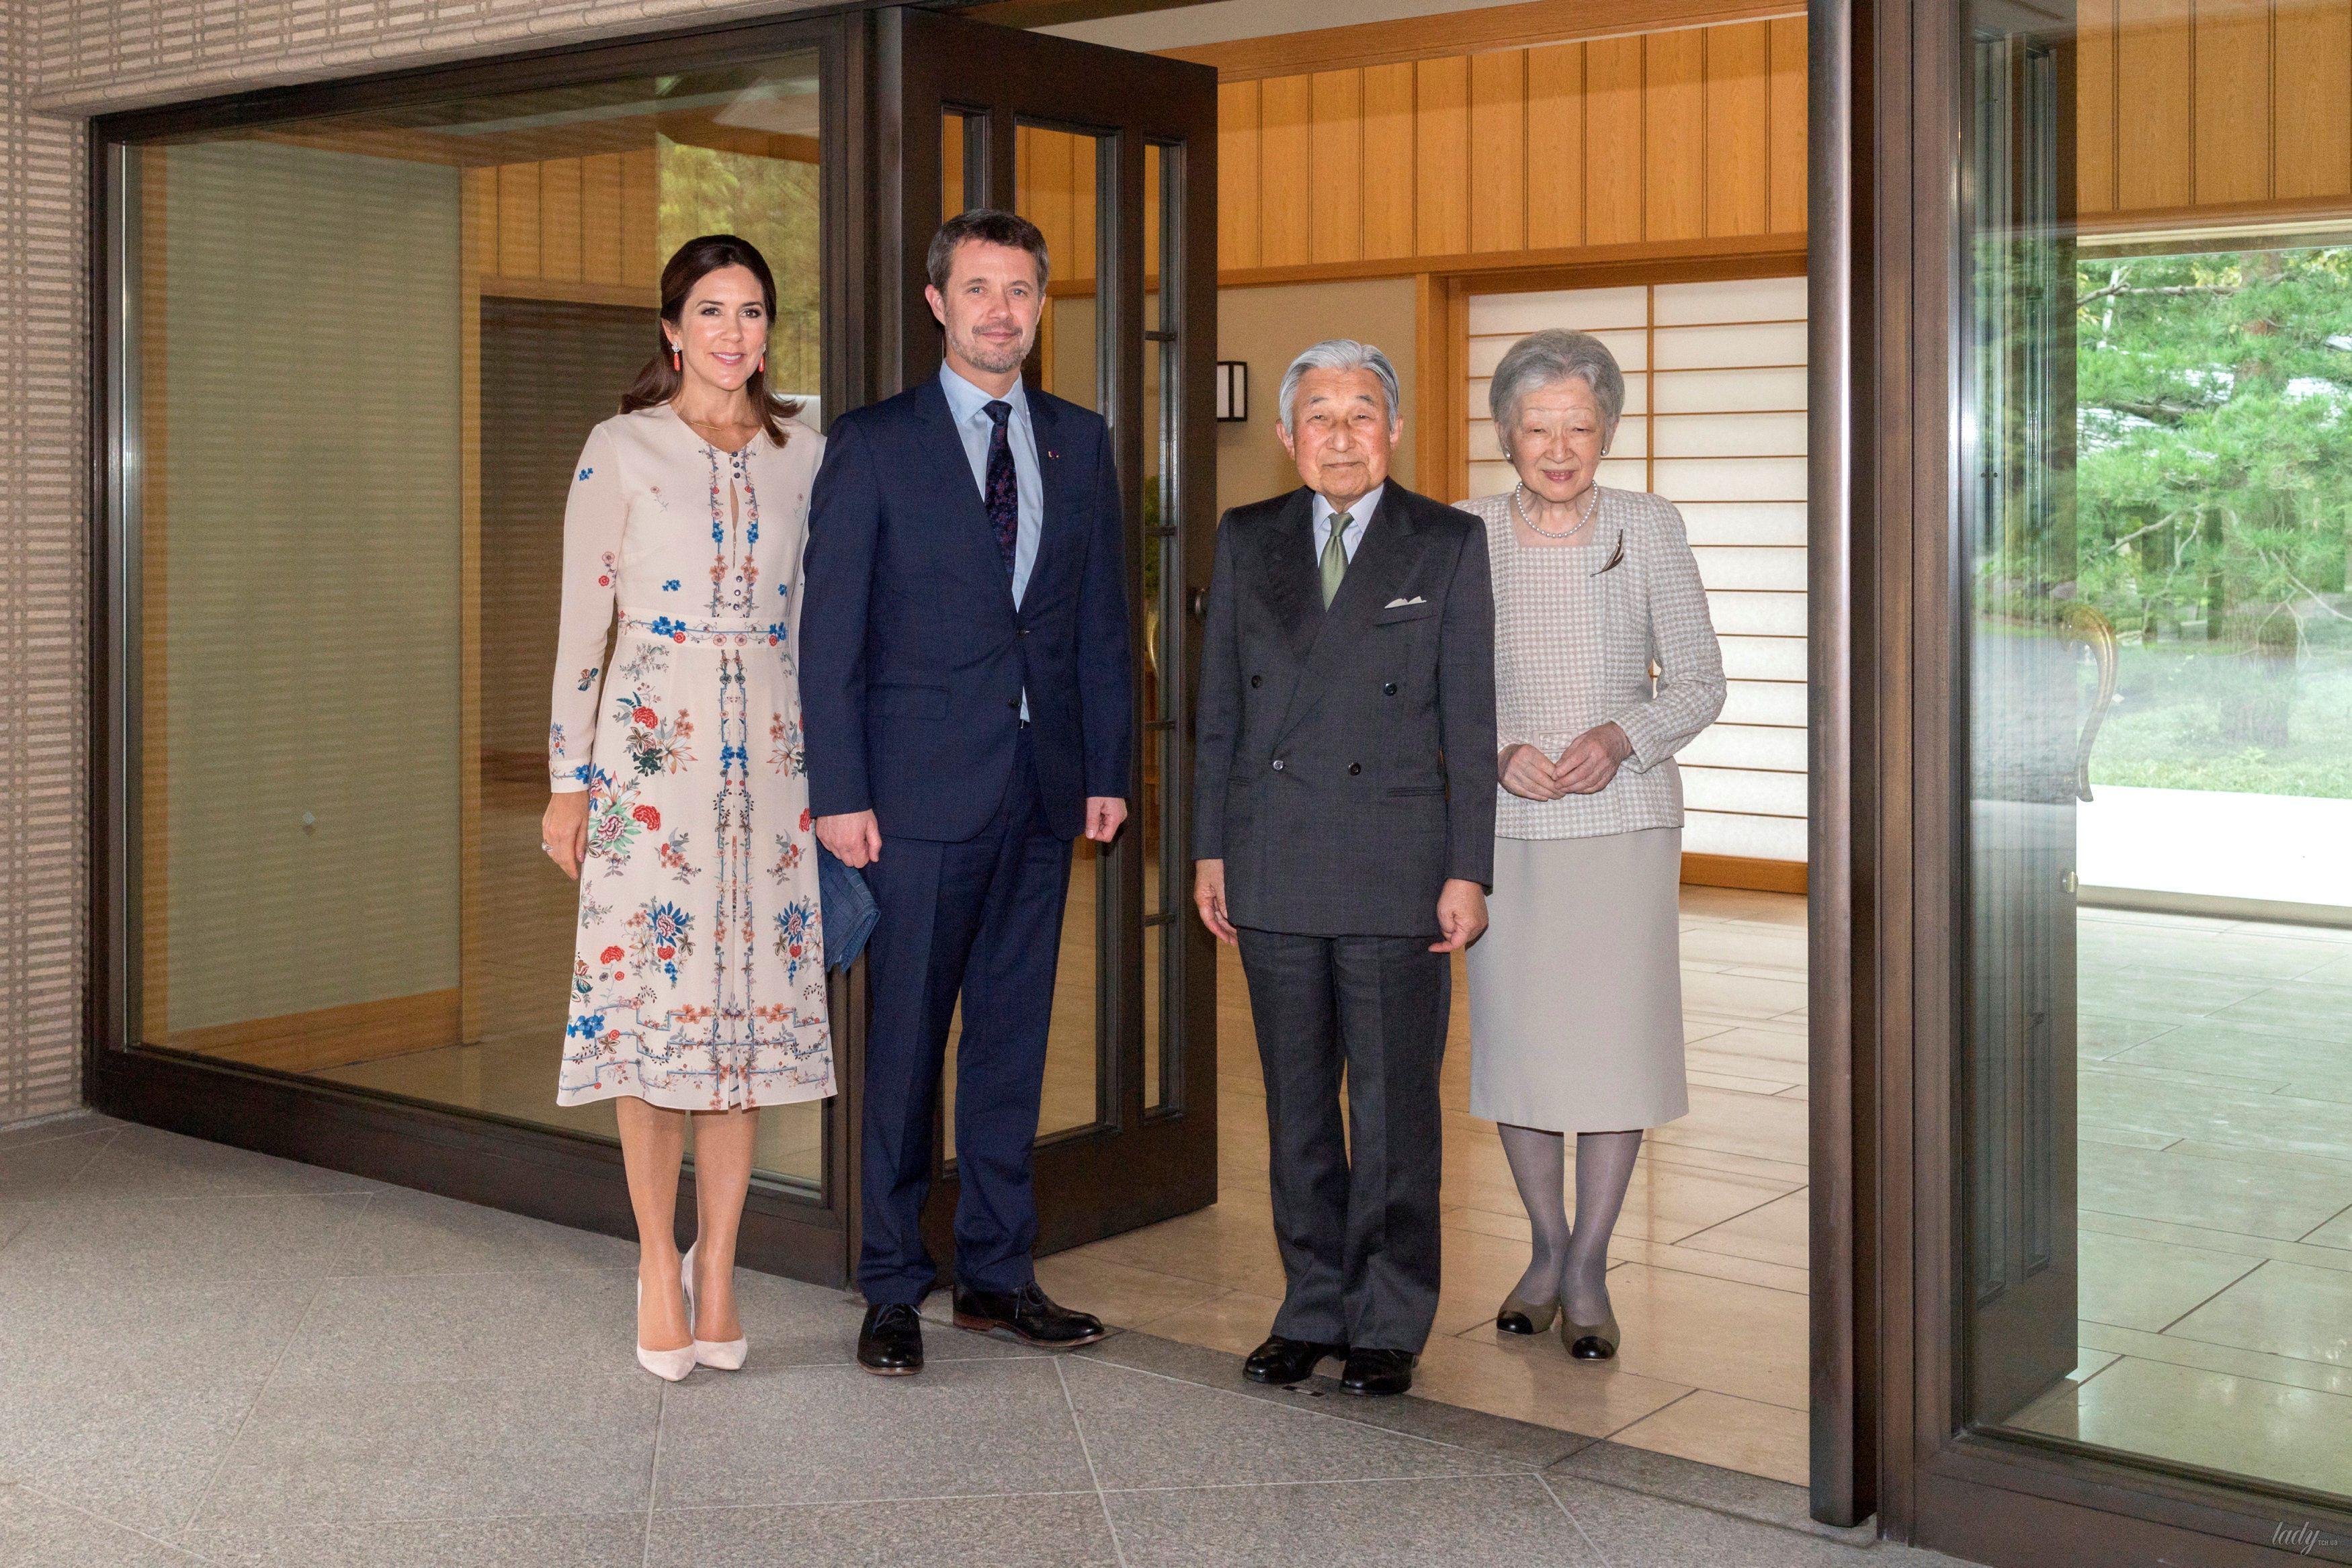 Кронпринц Дании Фредерик, кронпринцесса Мэри, японский император Акихито и императрица Митико_2